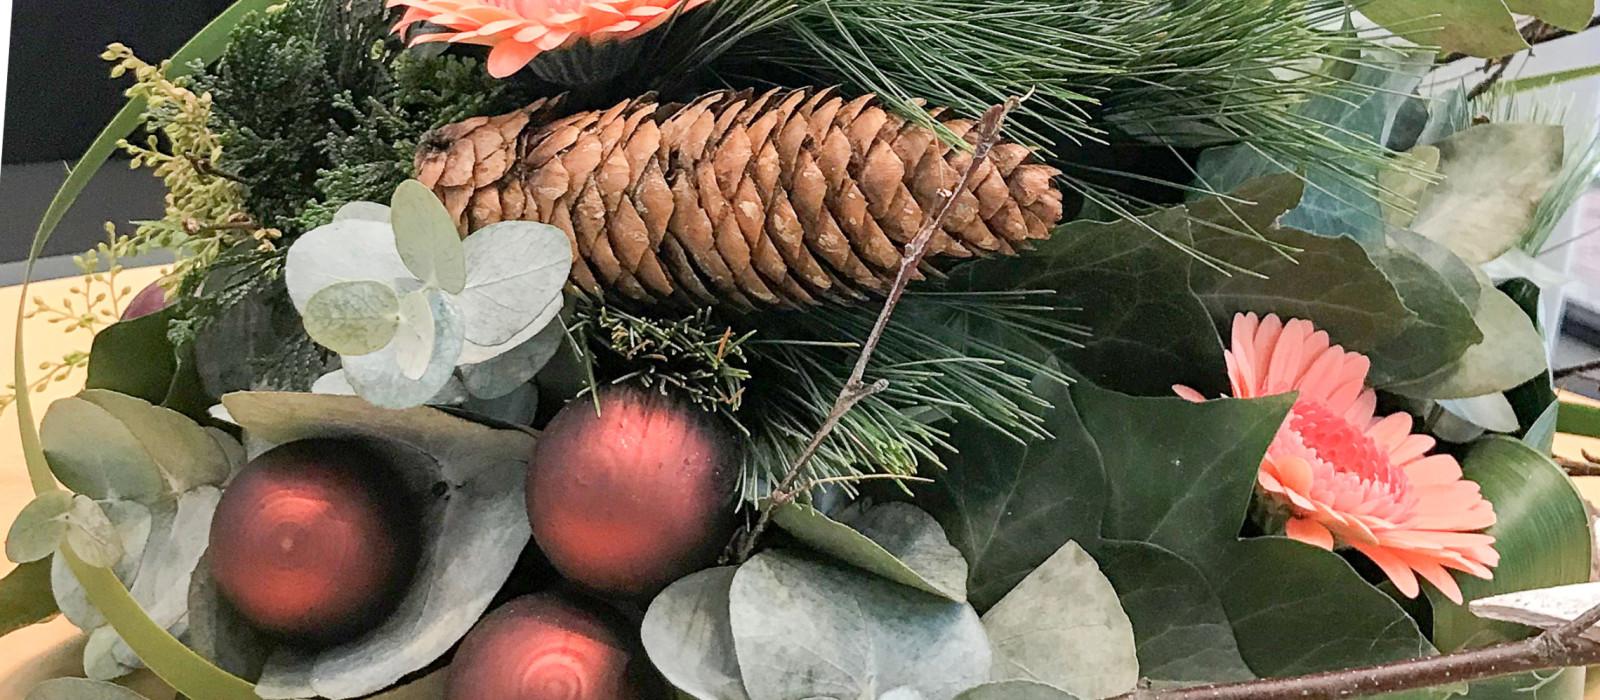 Inzameling rond feestdagen